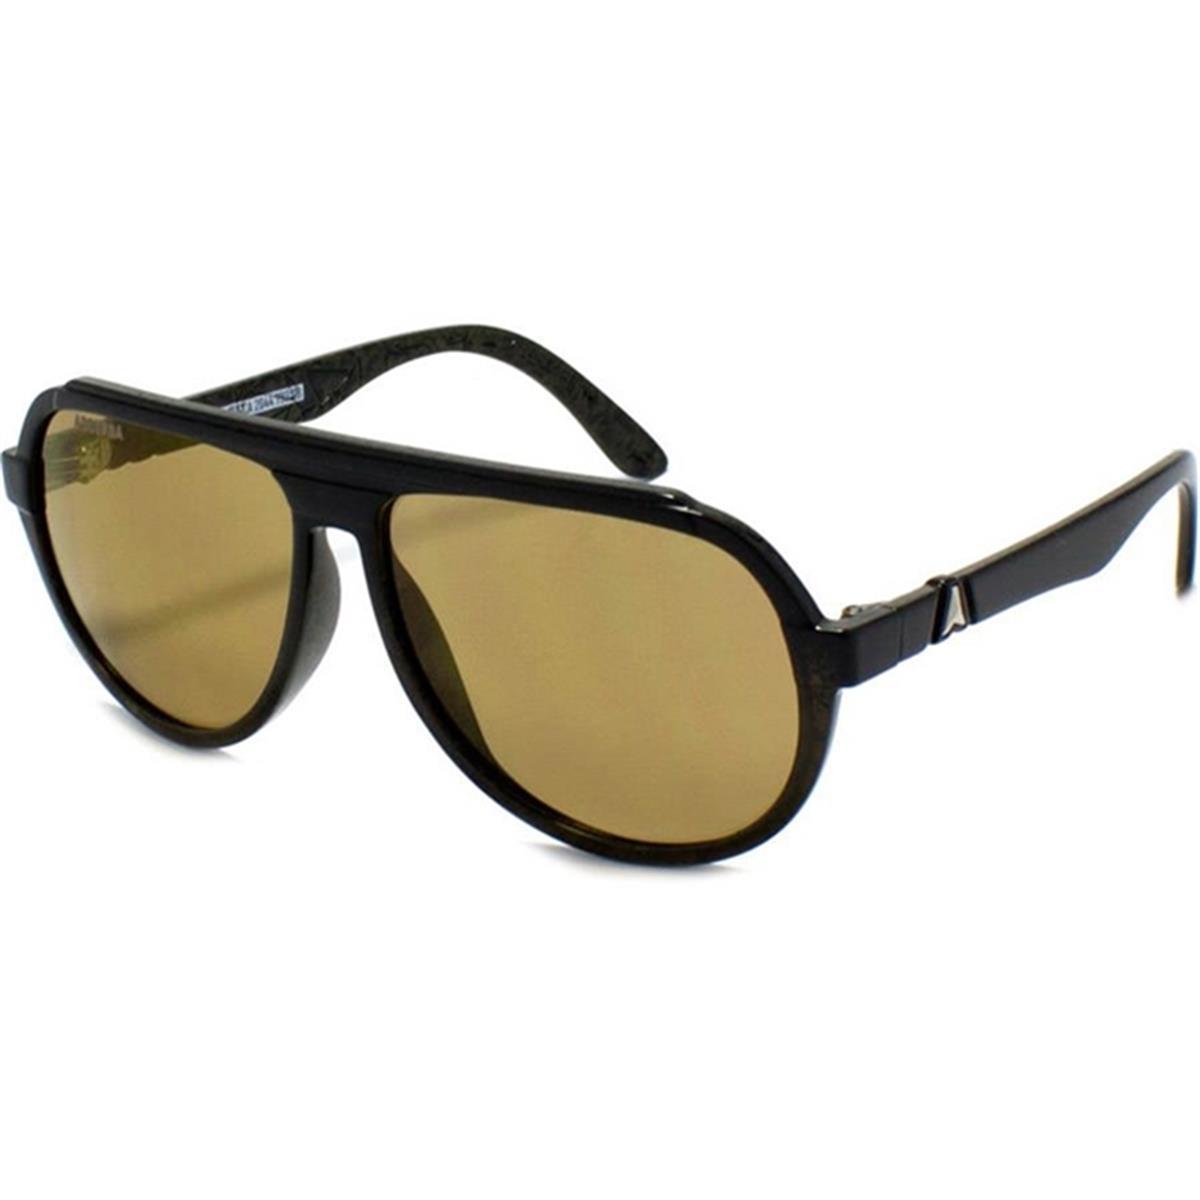 c2d2e7278 Óculos de Sol com Lente Dourada Retrô La Rocca Absurda